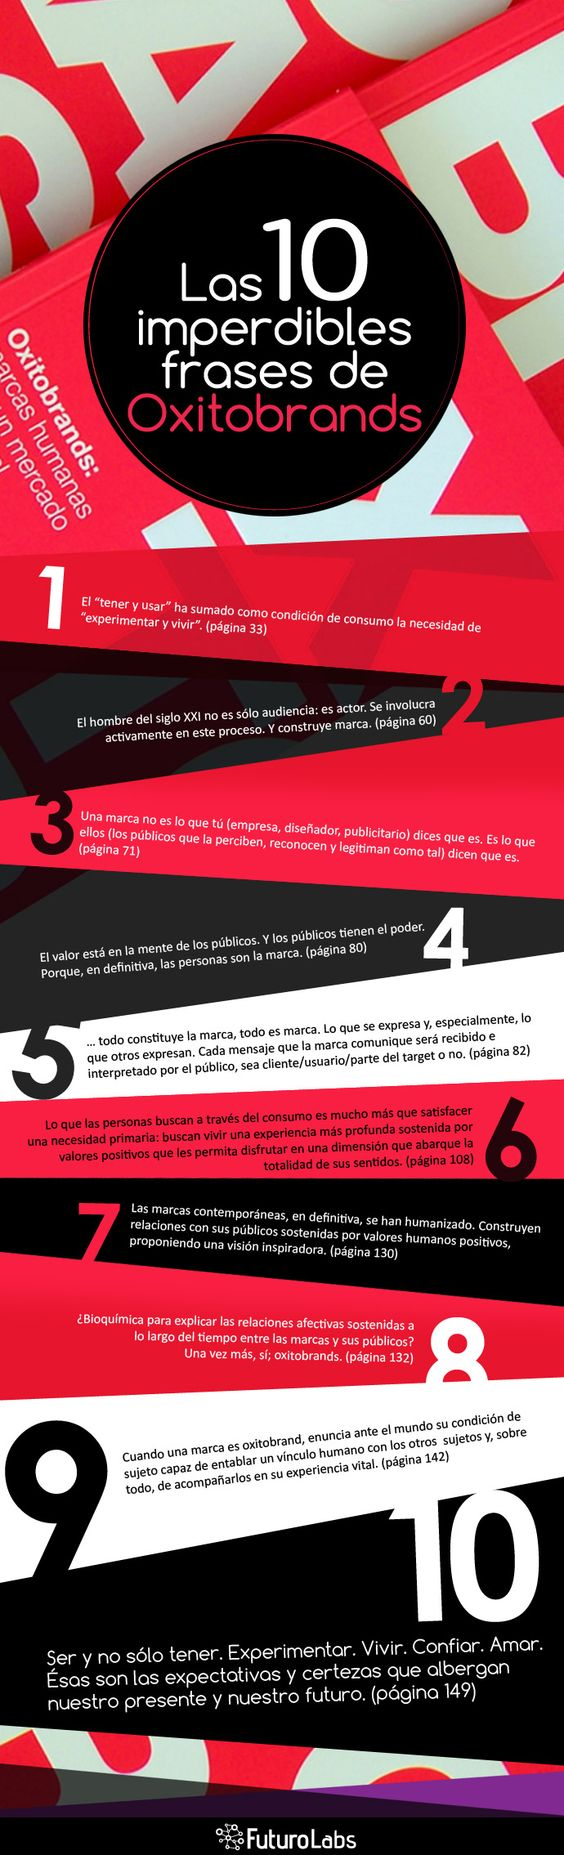 las 10 imperdibles frases de Oxitobrands